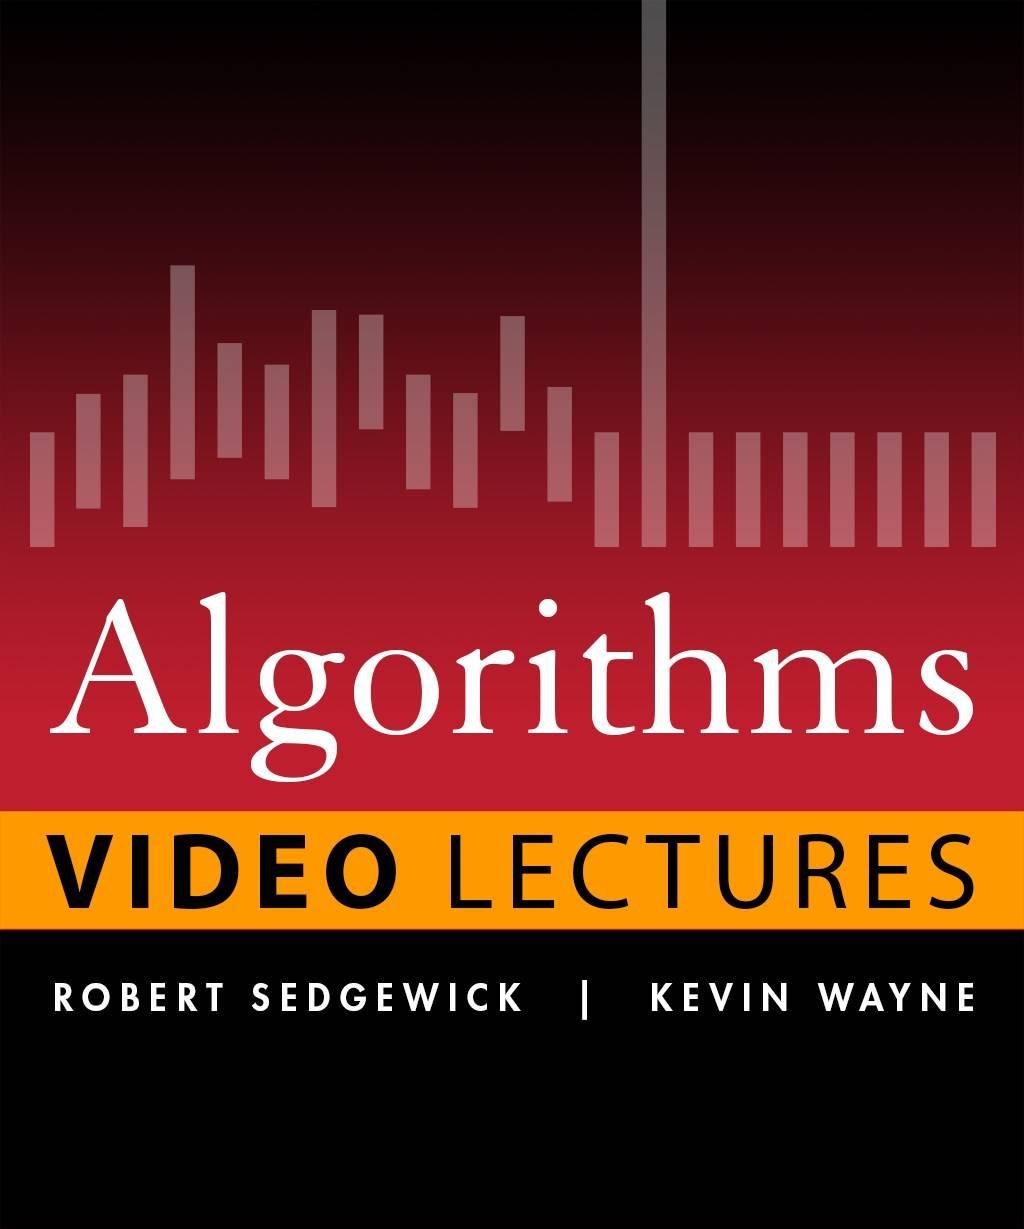 Lecture Series: Algorithms 24 Part Lecture Series [repost